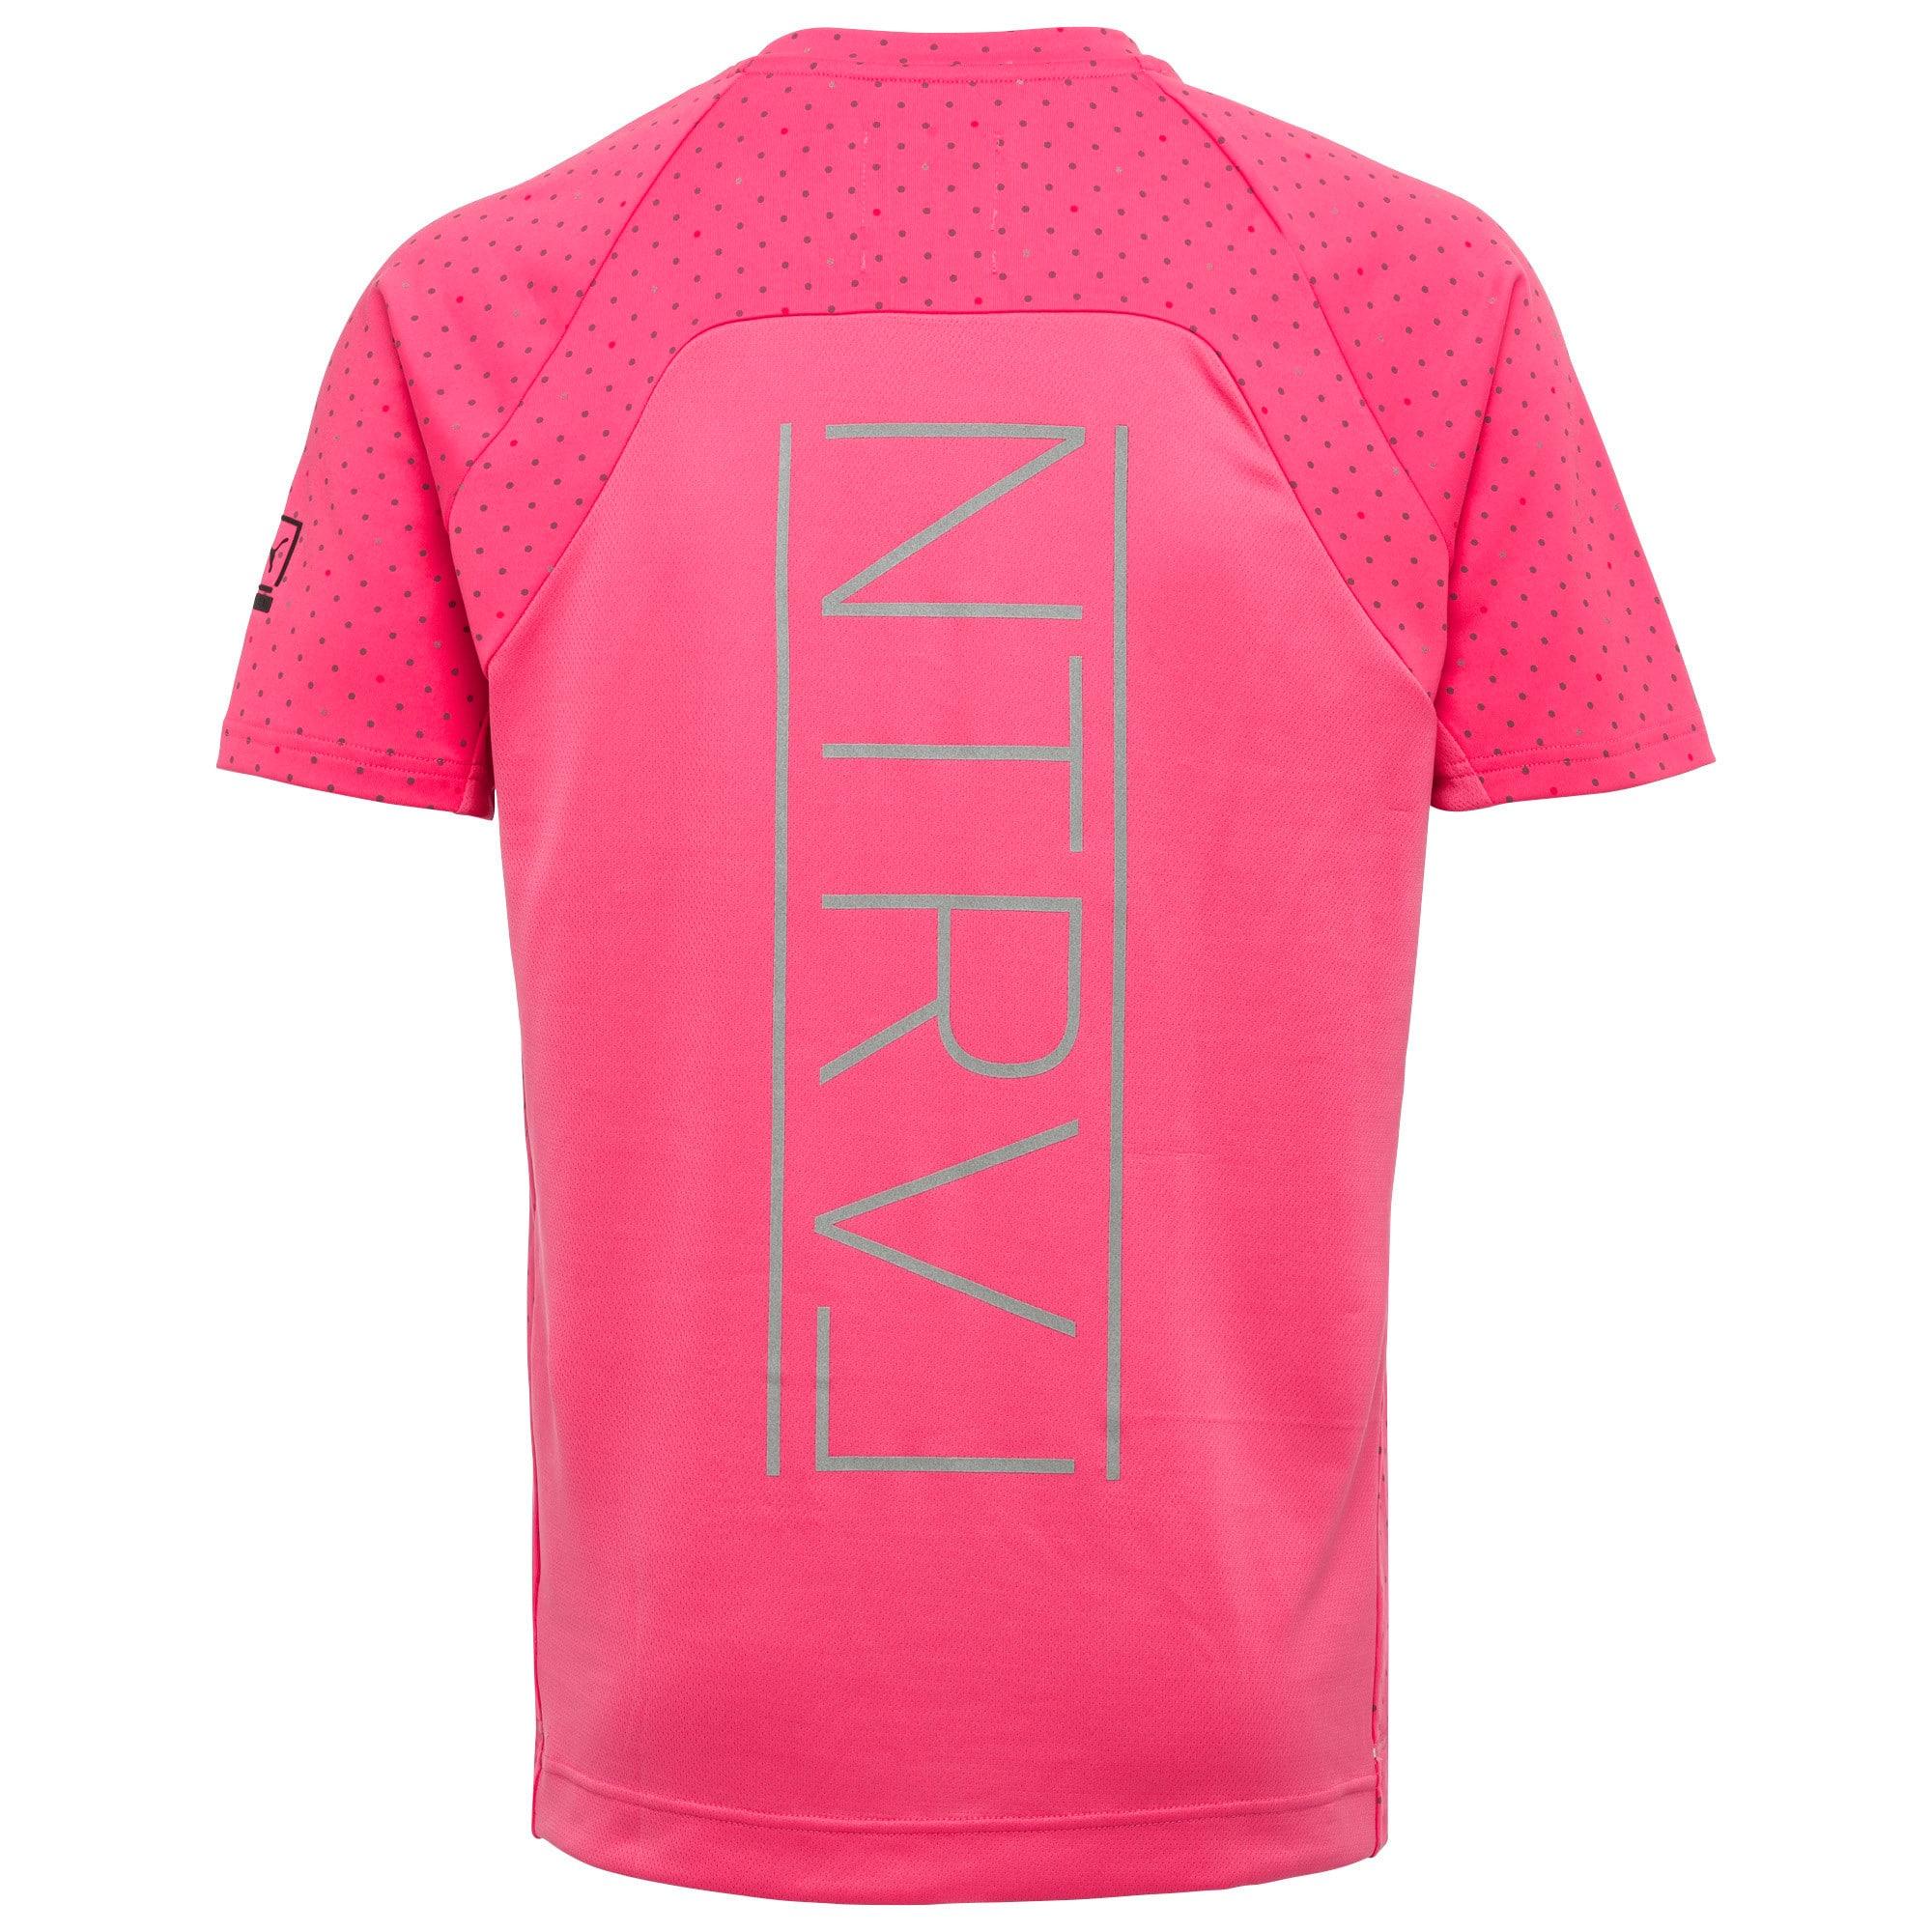 Thumbnail 2 of PUMA x STAPLE T-Shirt, Paradise Pink, medium-IND